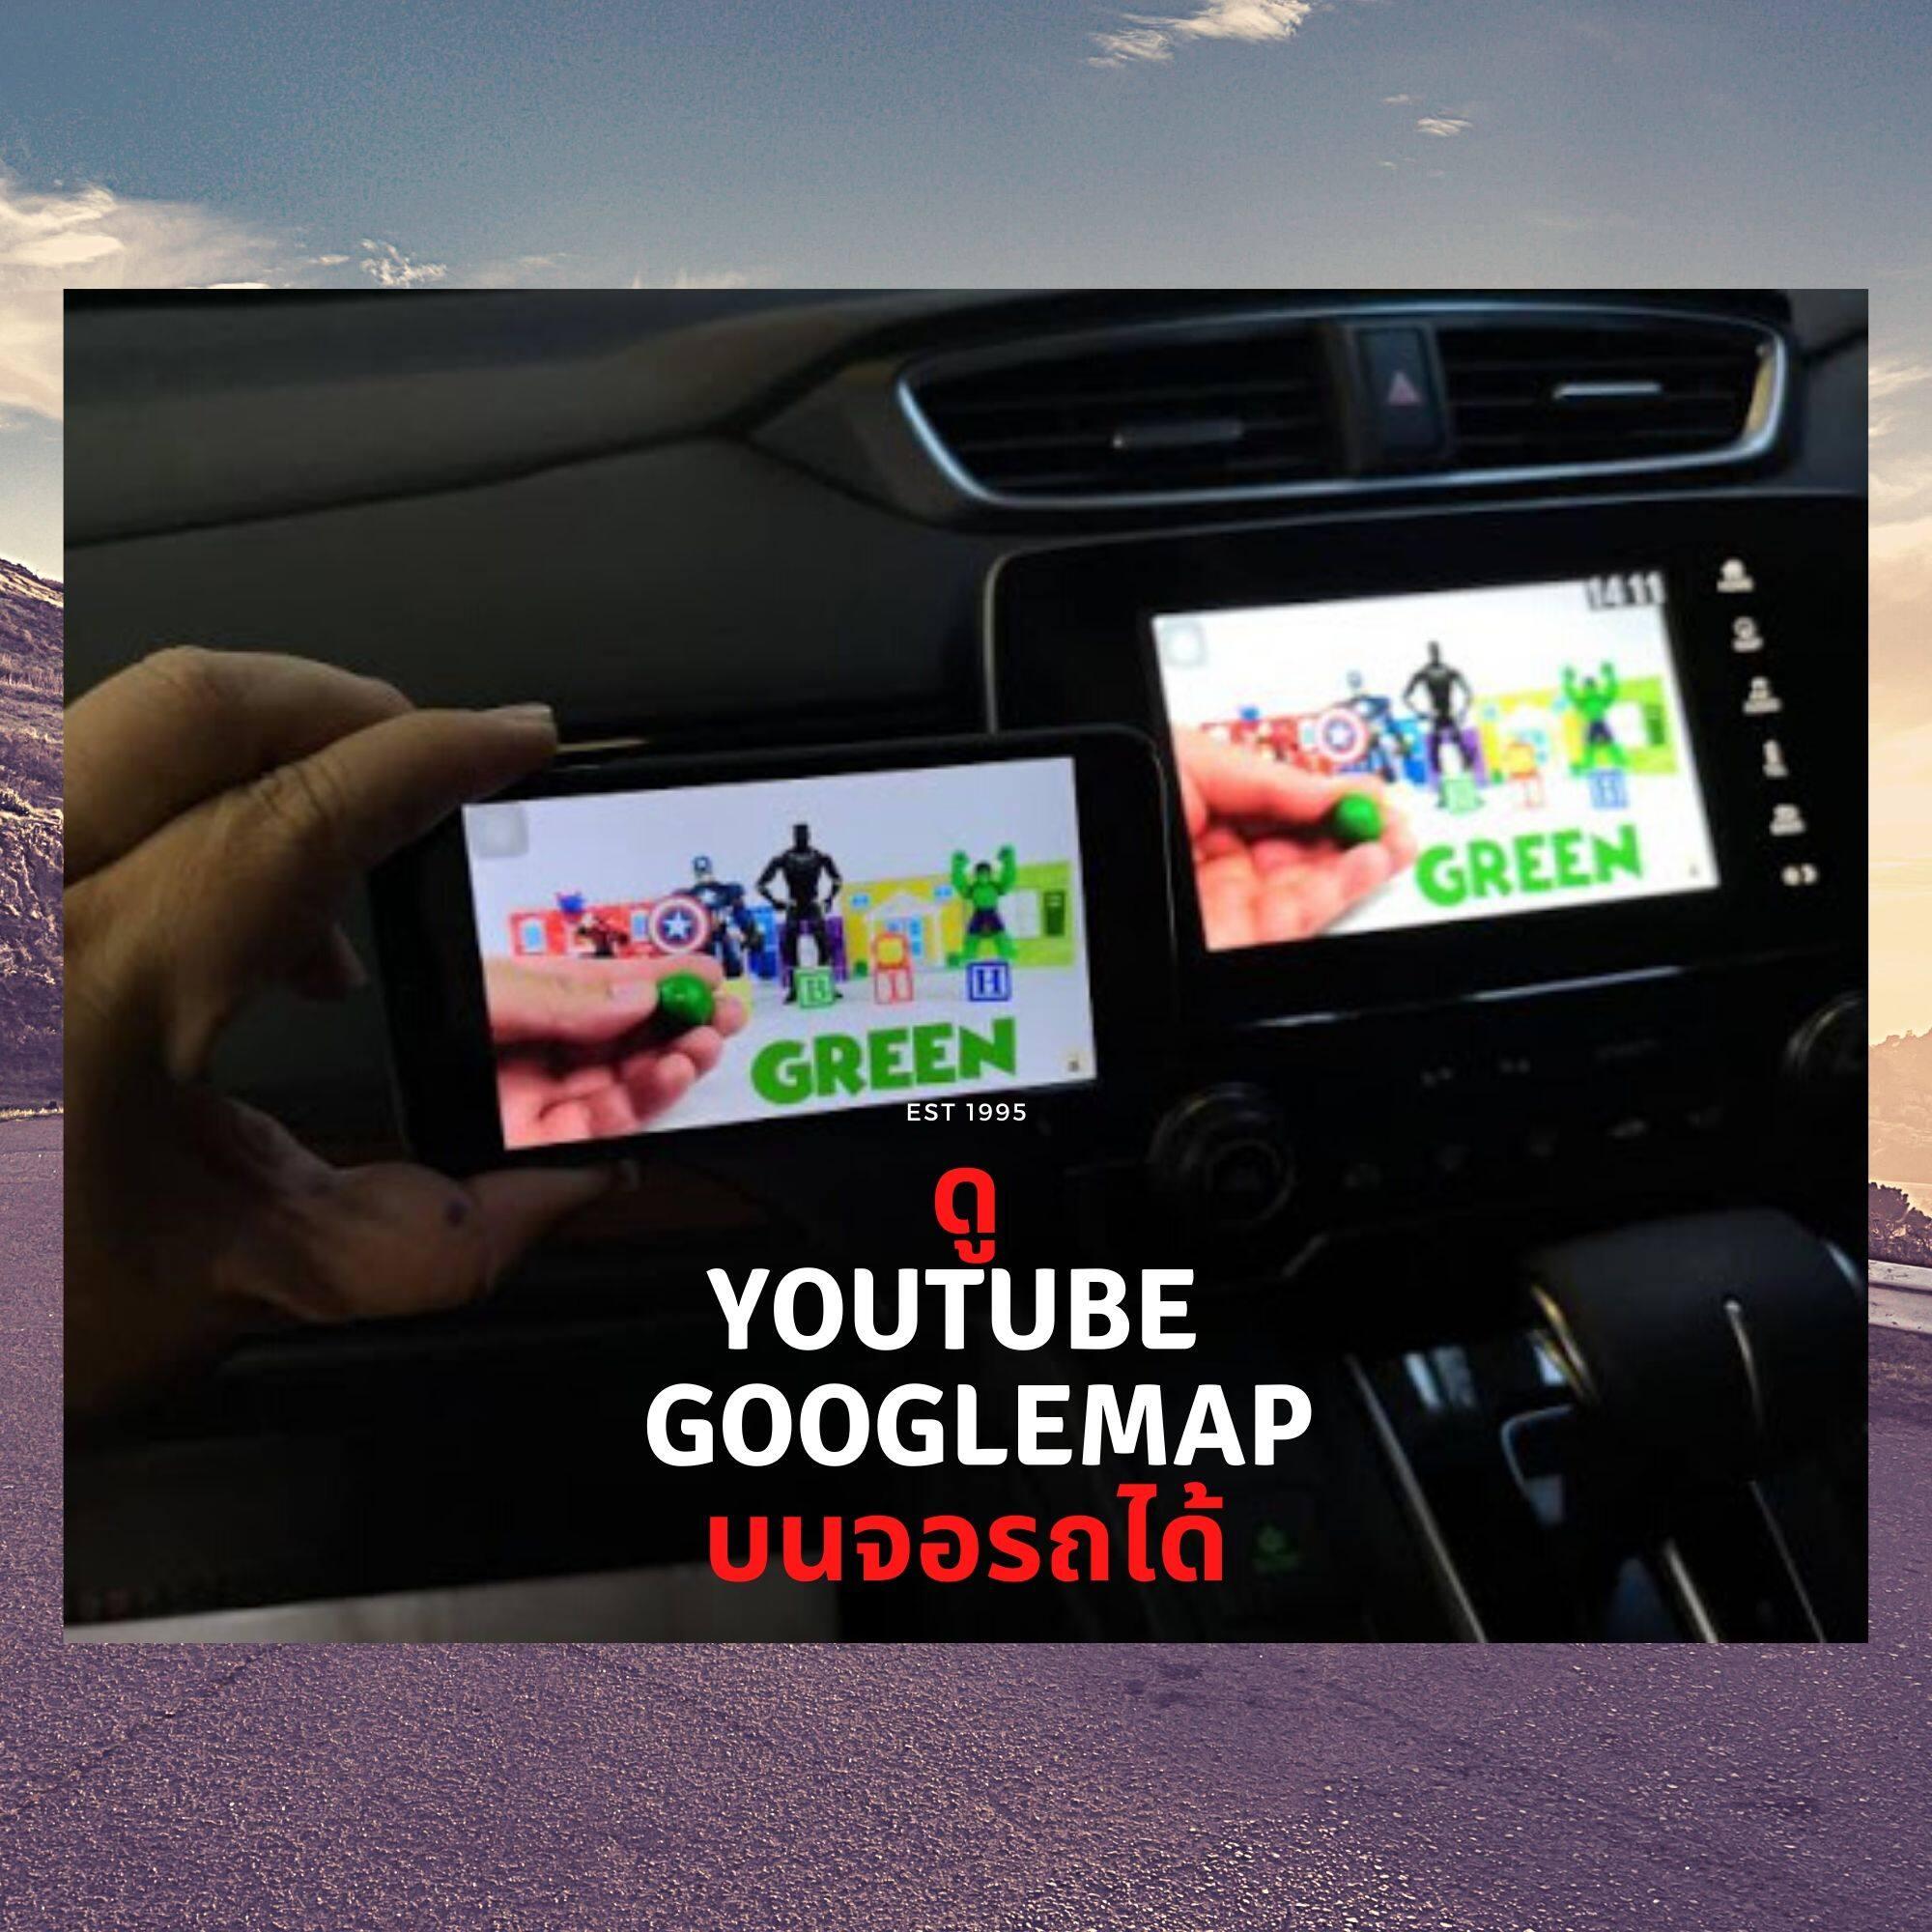 Novel Hdmi Wifi Display อุปกรณ์เชื่อมต่อมือถือขึ้นจอรถยนต์ และ ทีวีบ้าน ด้วยระบบไร้สาย.